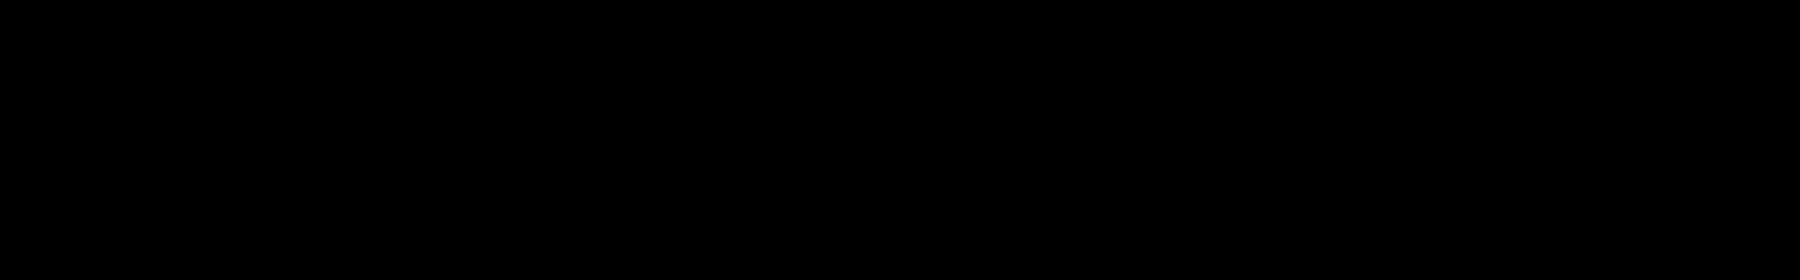 WZRD audio waveform